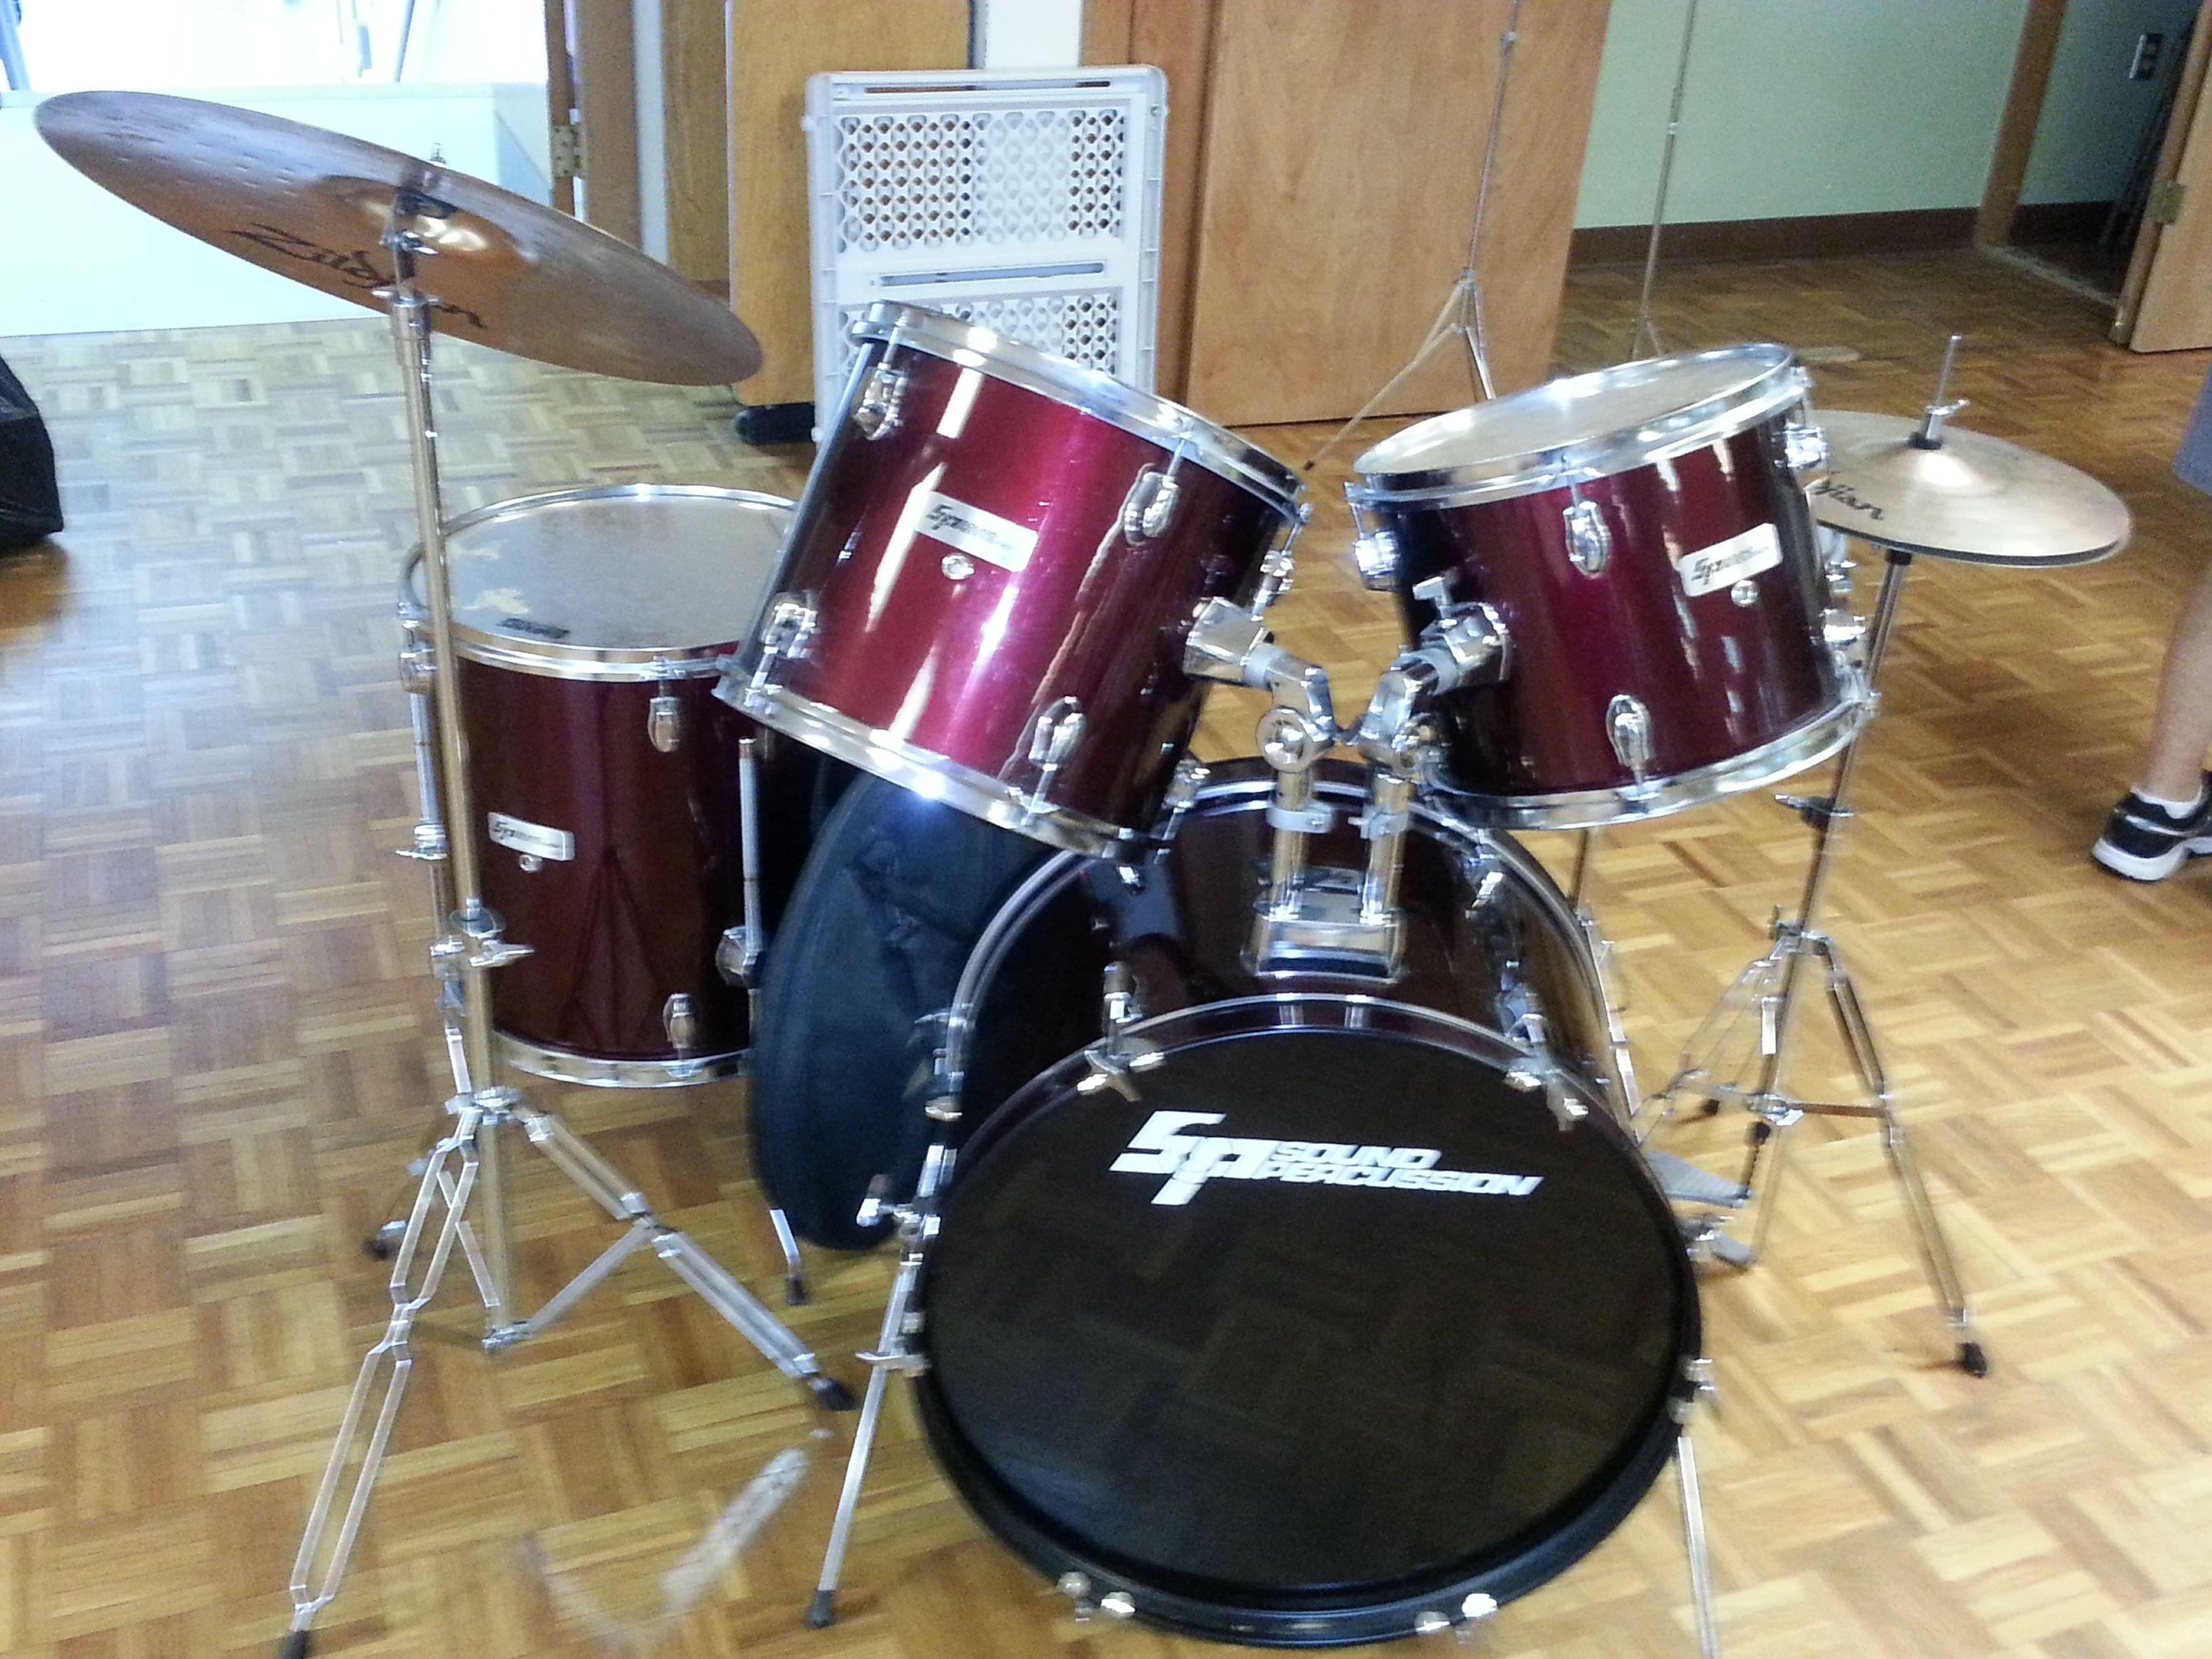 drum set for sale today yard sale 500 annual church ladies yard sale extravaganza drum. Black Bedroom Furniture Sets. Home Design Ideas